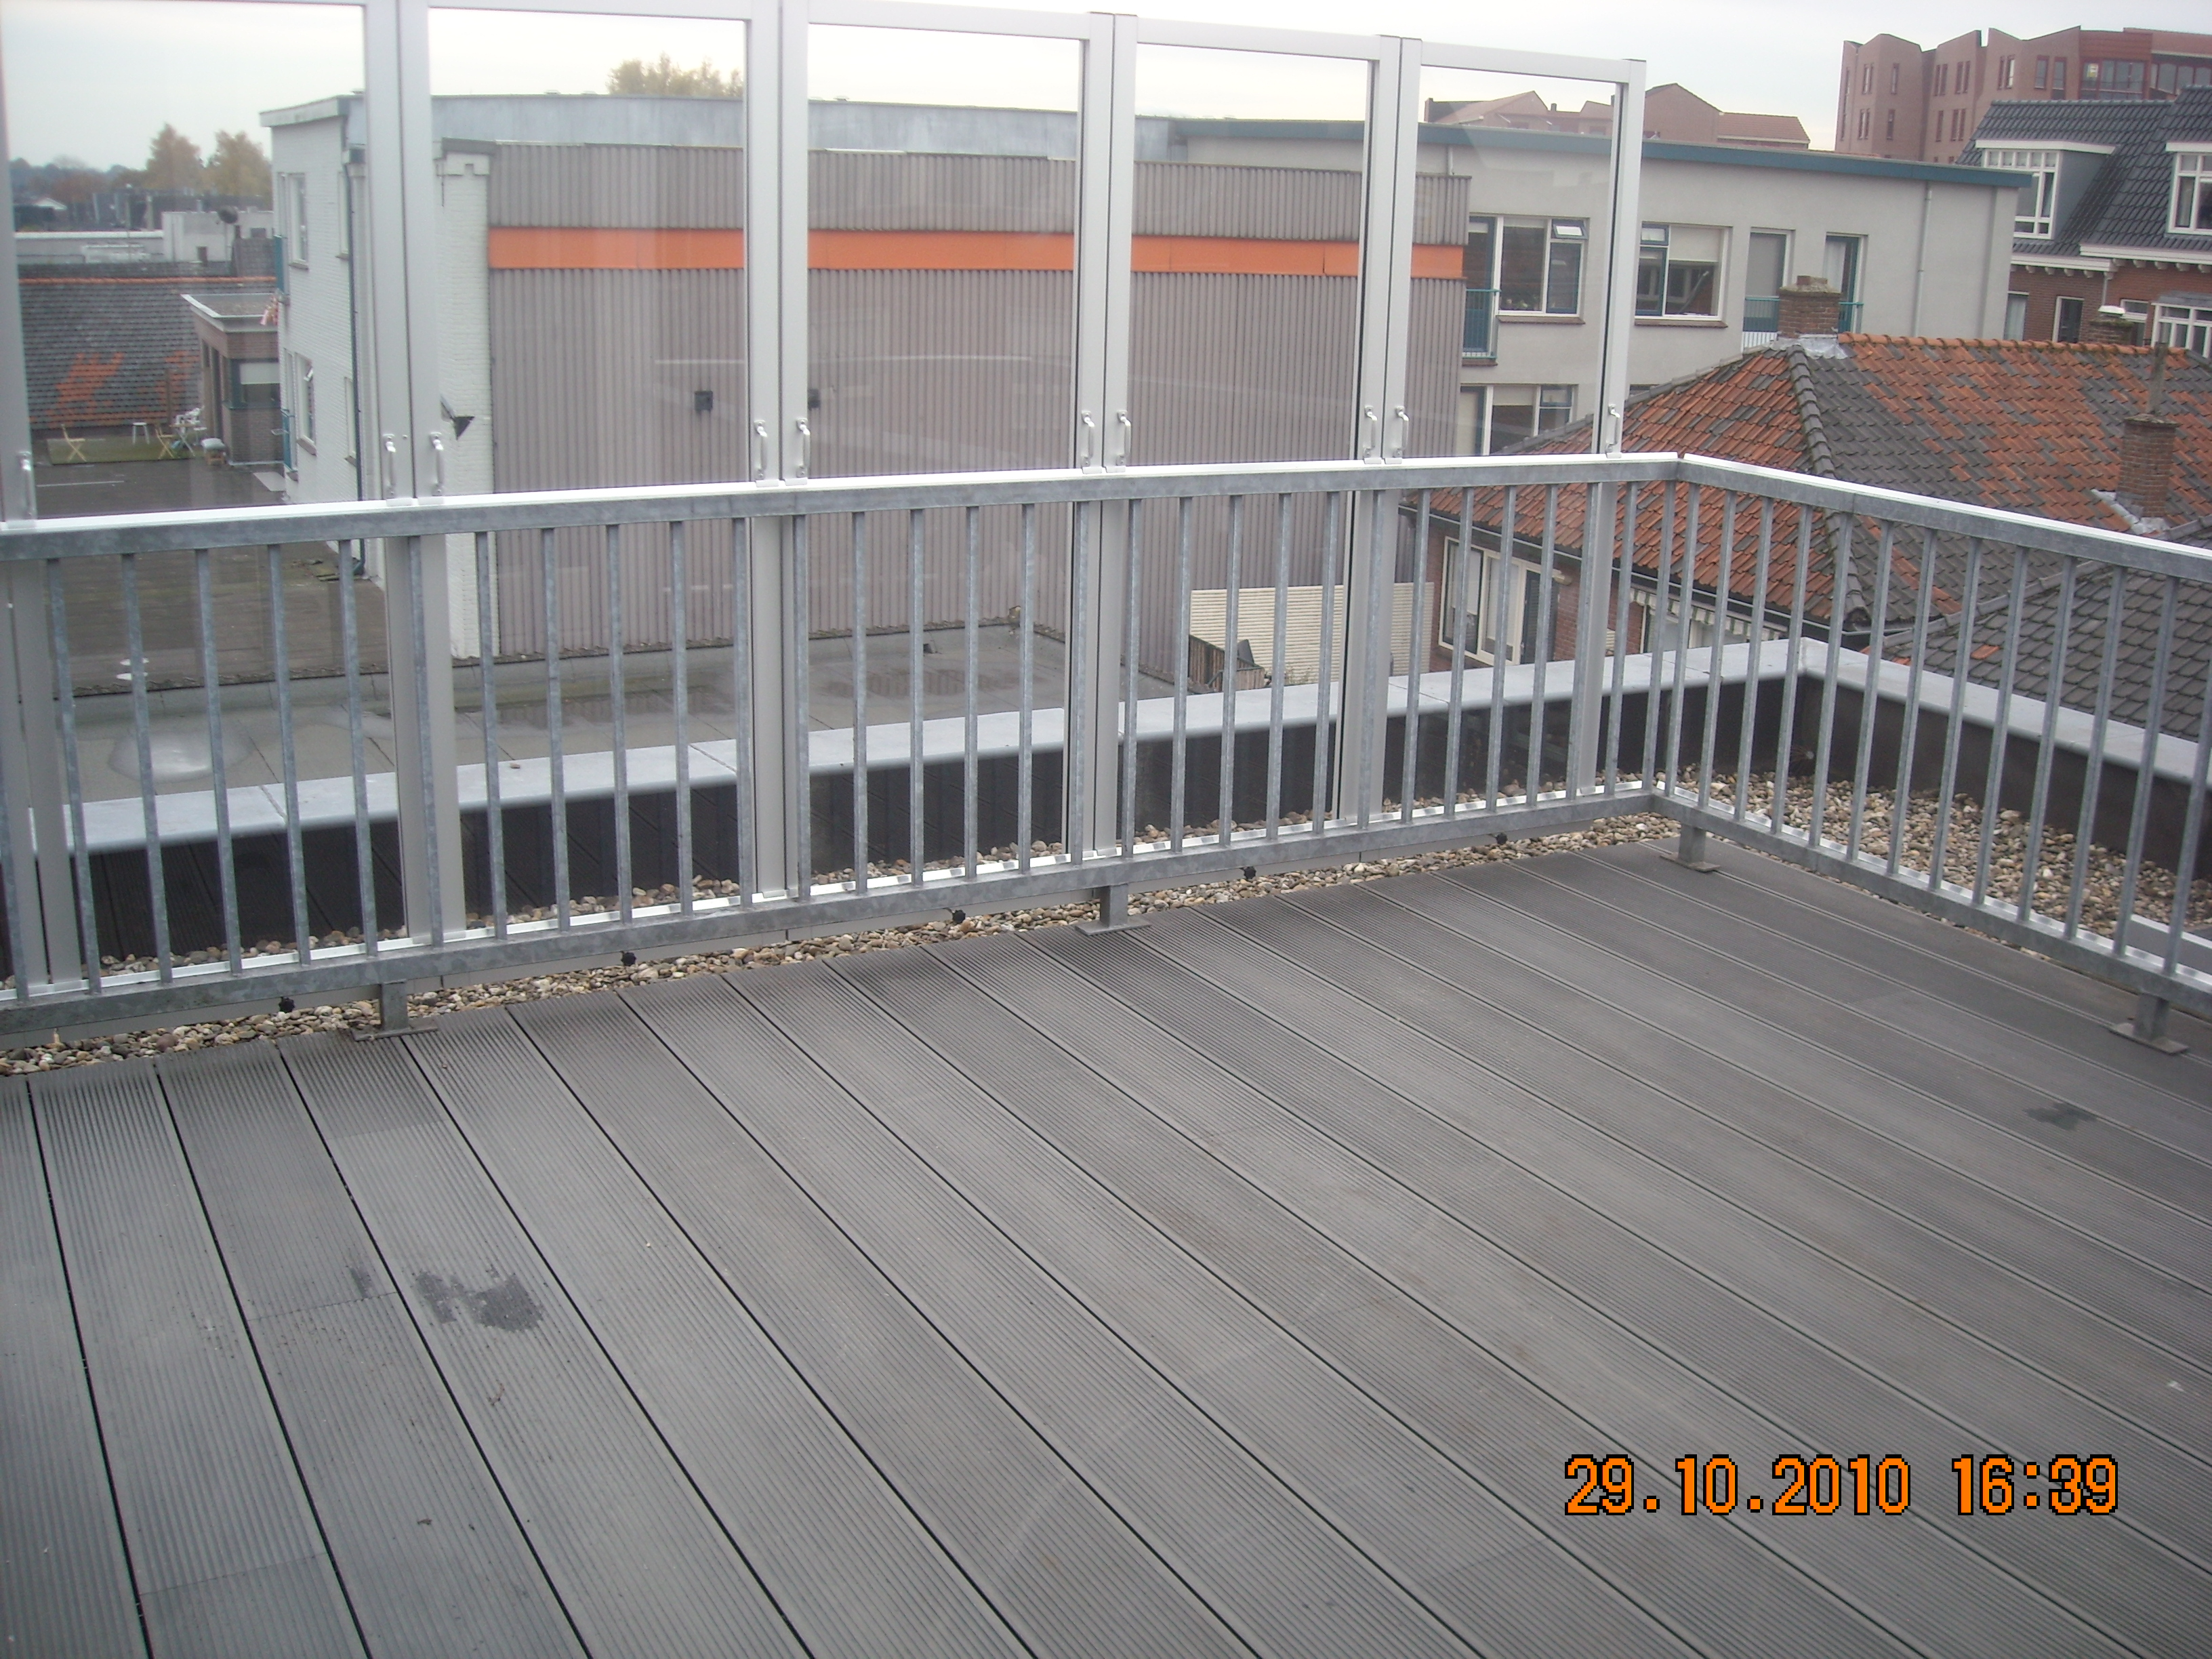 Kleine Badkamer Ikea ~ in Barneveld Buitenkeuken in Barneveld Badkamer in Amersfoort